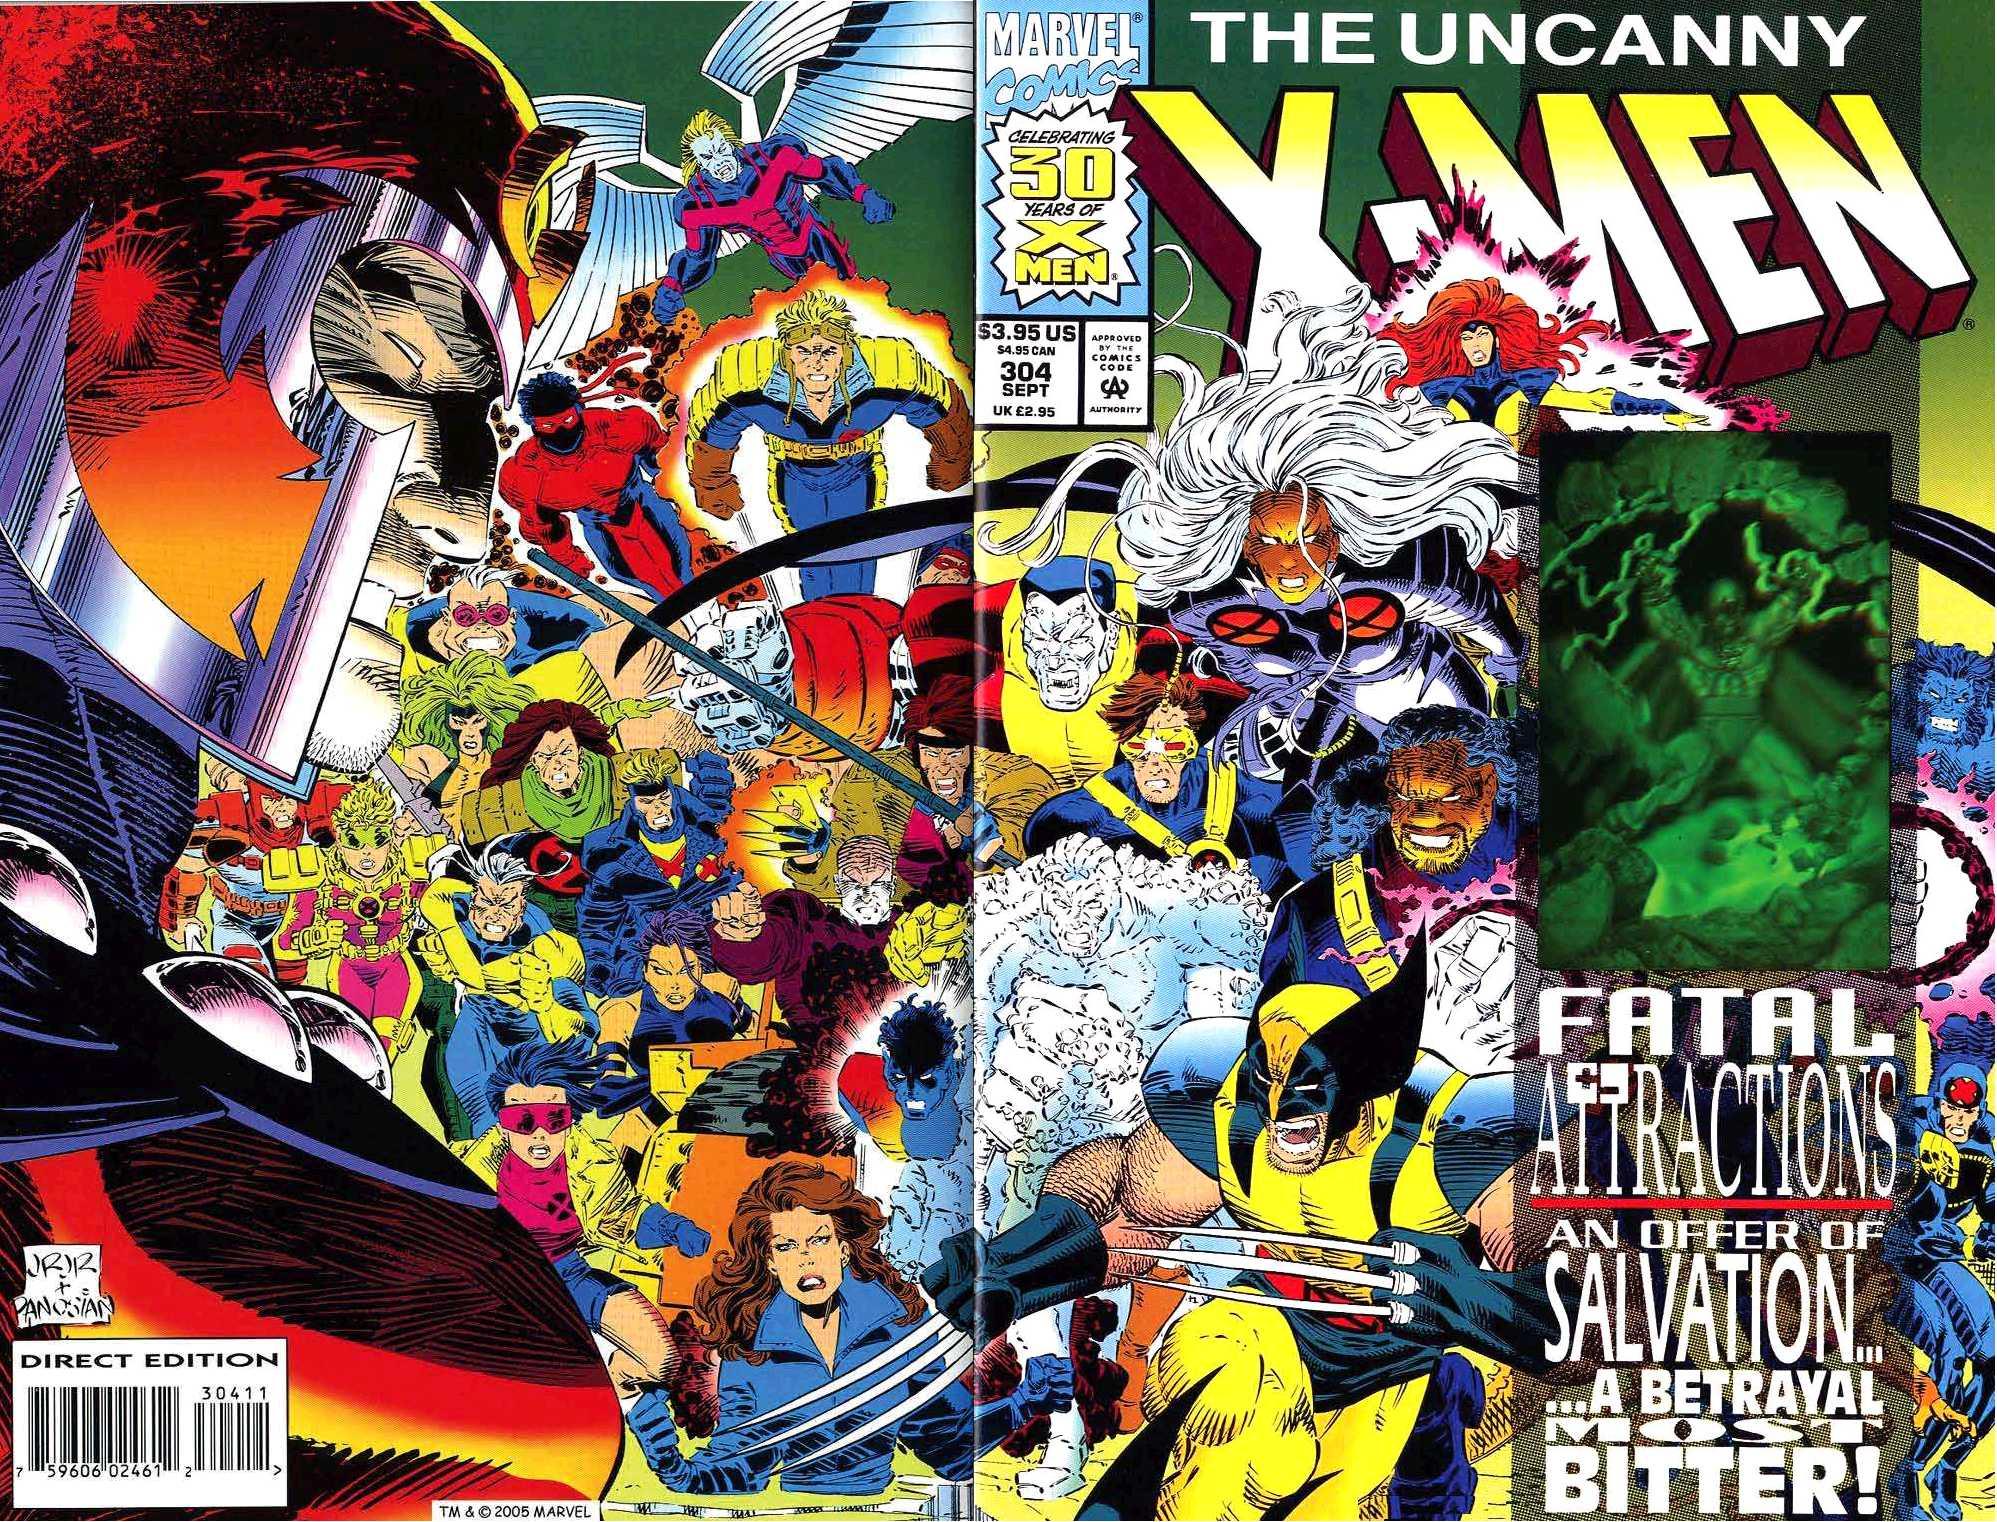 Uncanny_X-Men_Vol_1_304_Wraparound_Cover.jpg